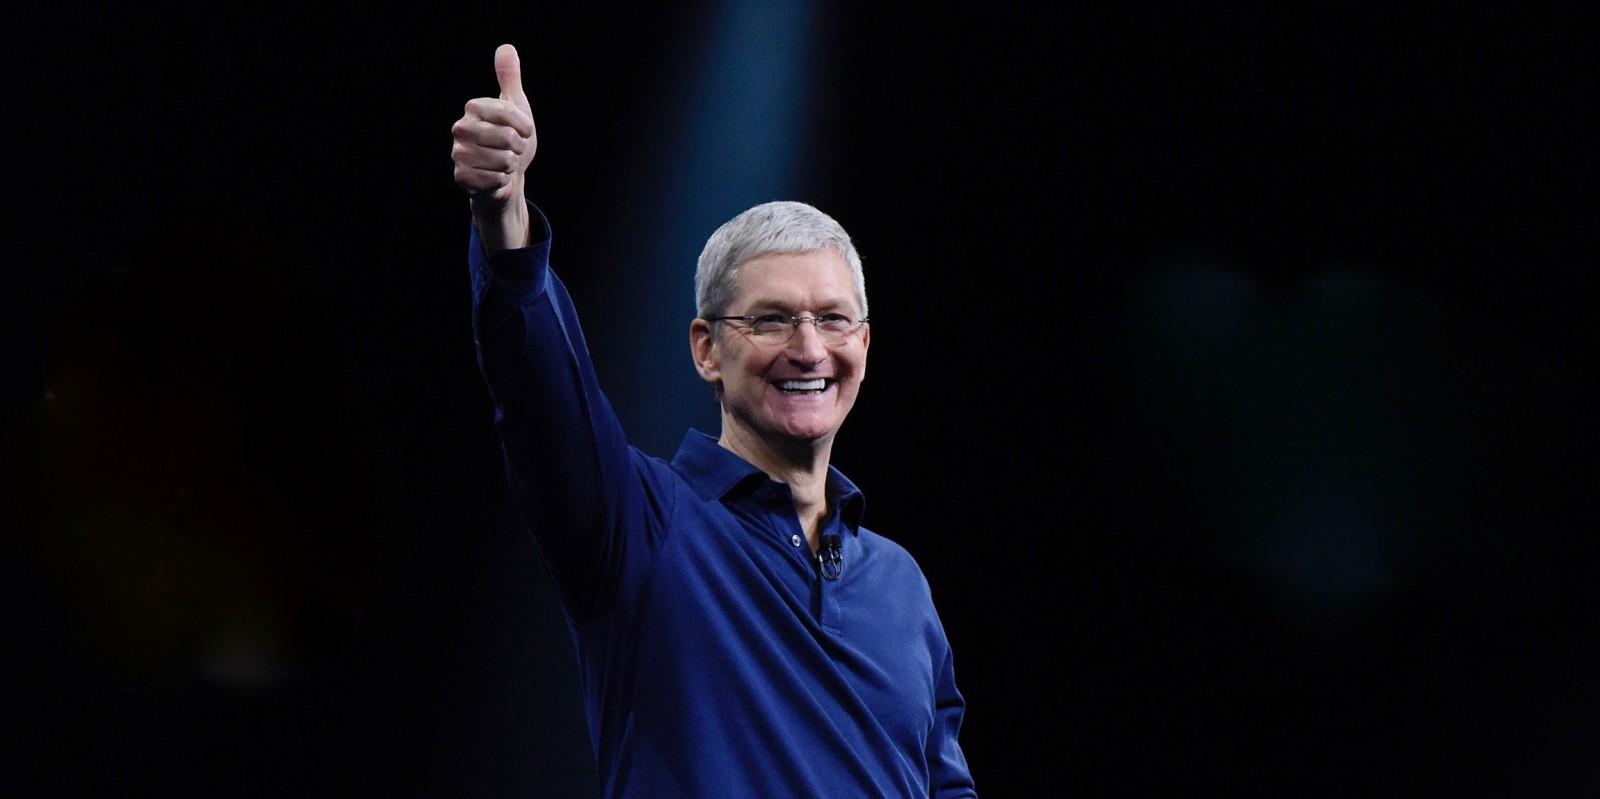 تیم کوک ۷۵۰ میلیون دلار سهام اپل